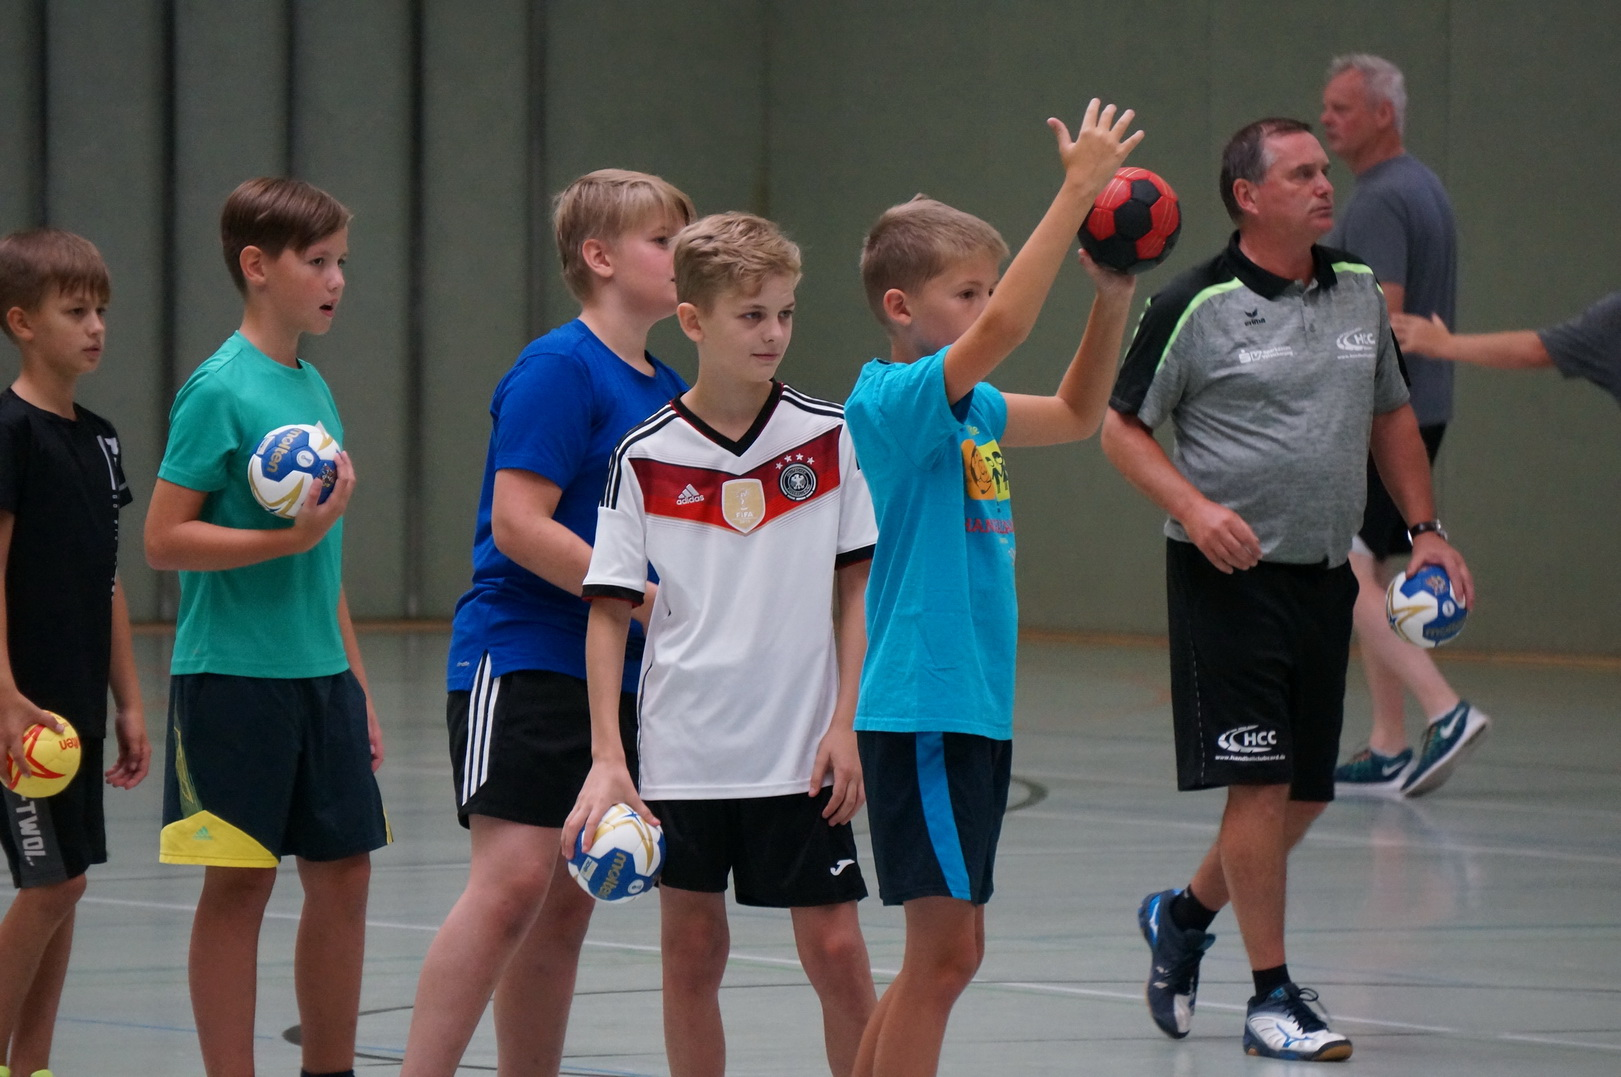 201808_Handballcamp_SDH_MG_074w